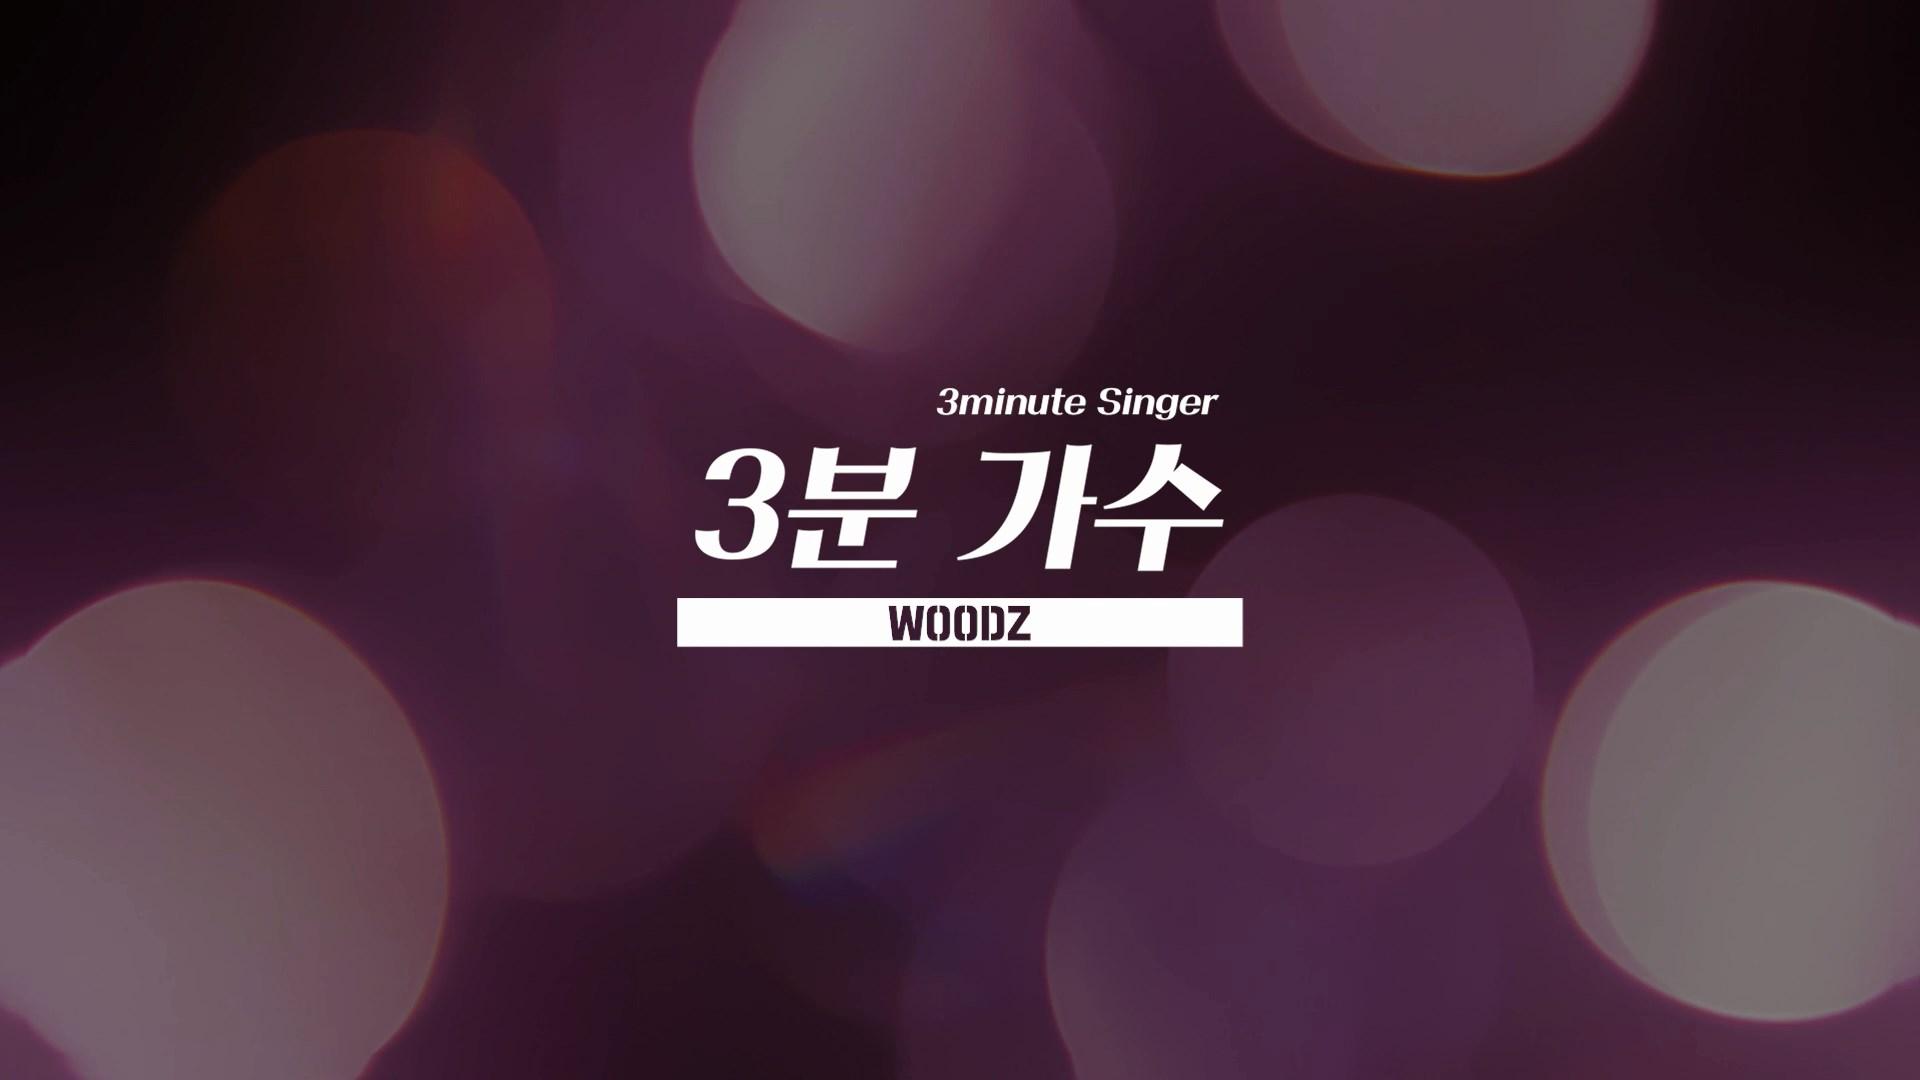 WOODZ(조승연) - 3분 가수 (3minute singer)